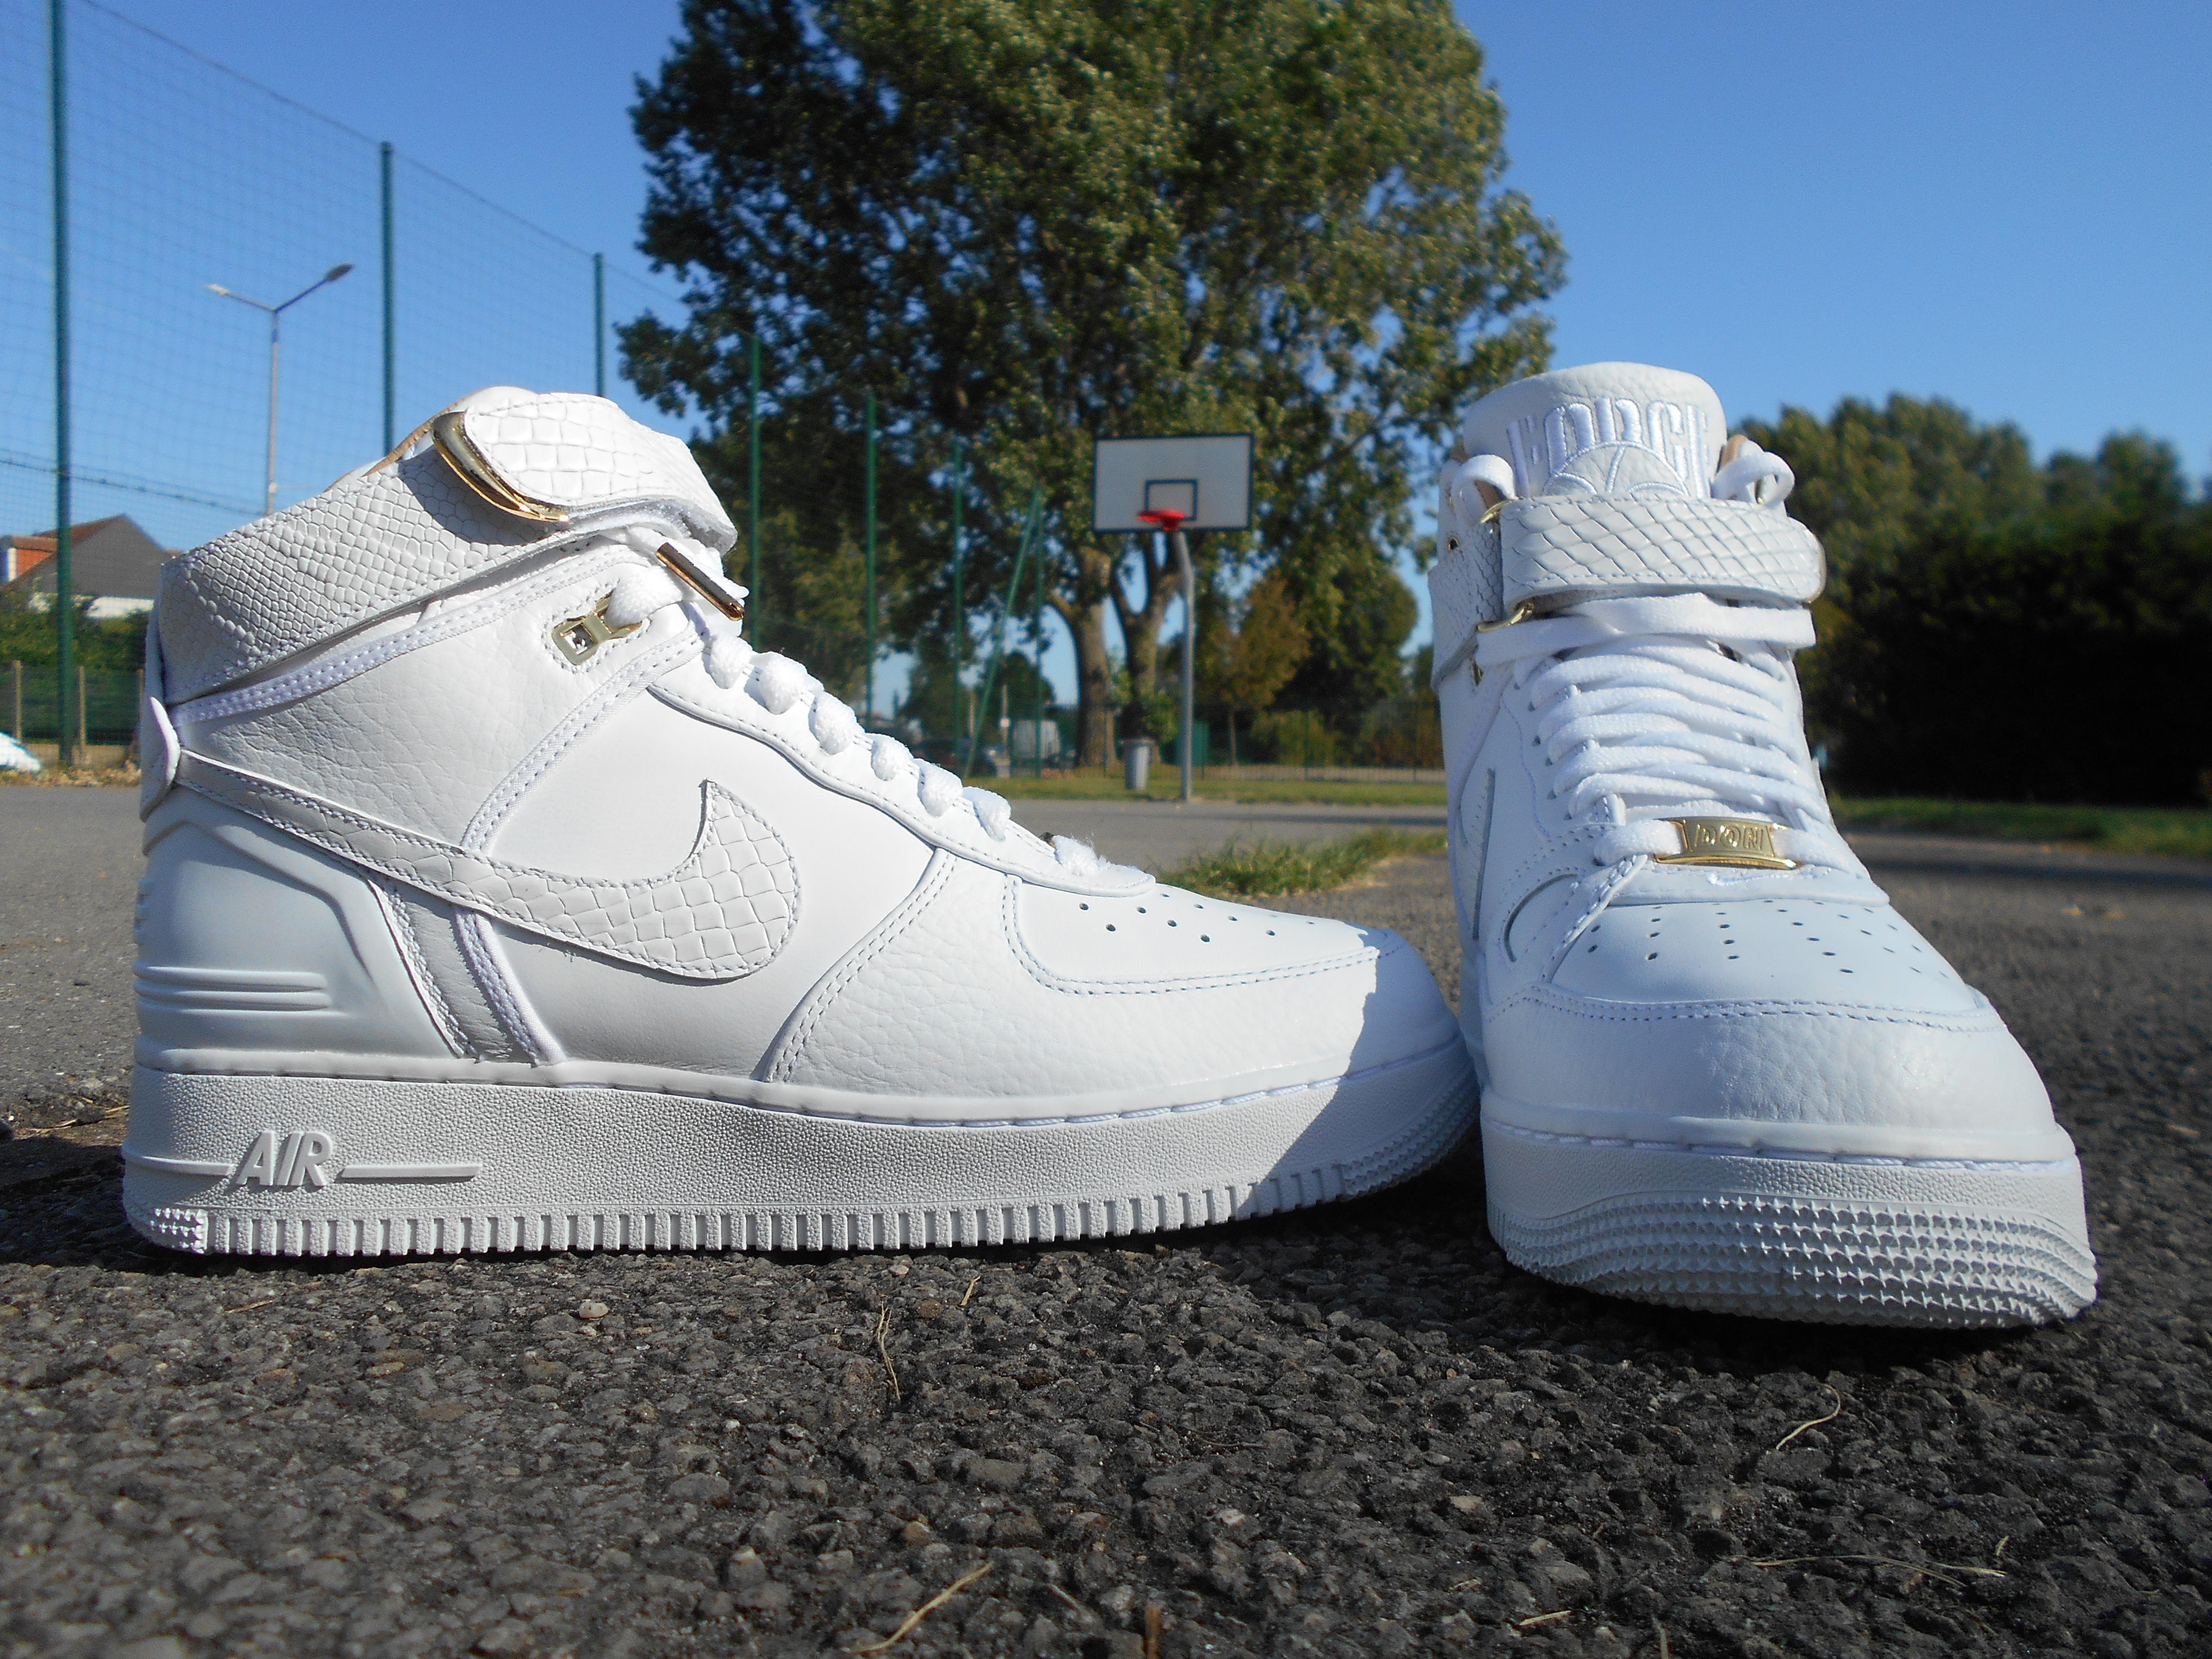 Fichier:Nike Air Force 1 Hi Just Don.jpg — Wikipédia